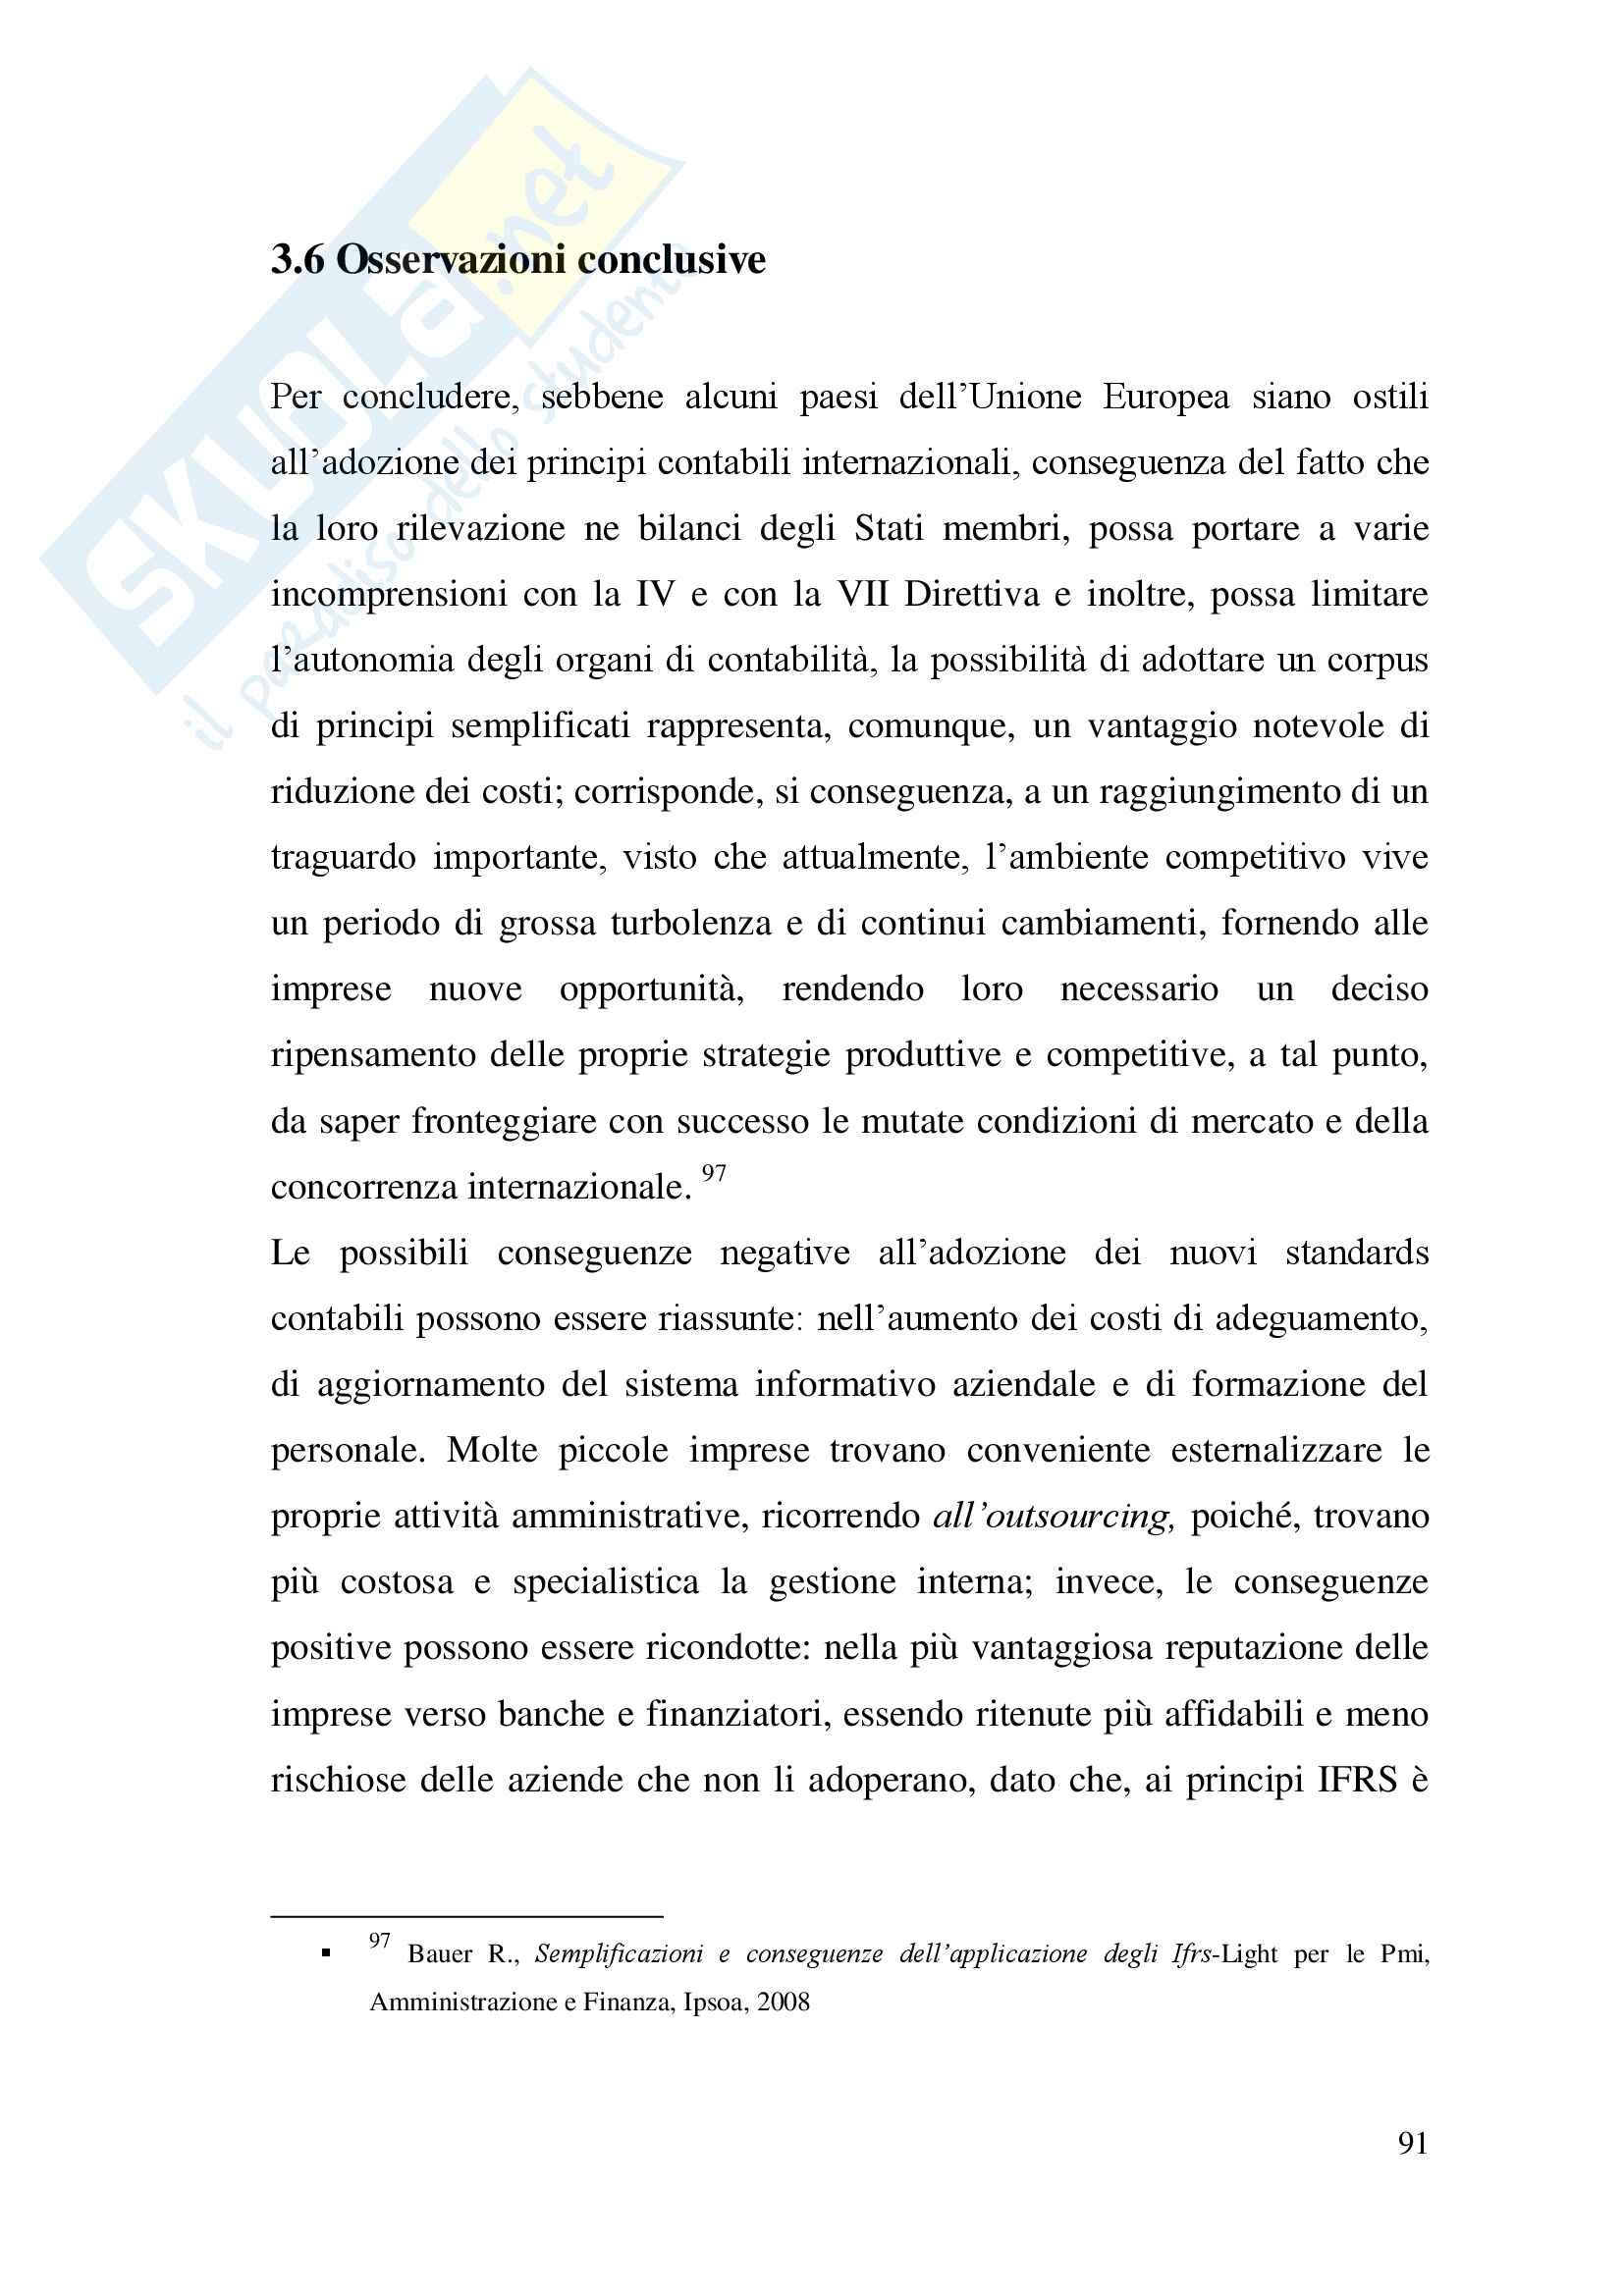 Tesi su Principi Contabili Internazionali Pag. 91